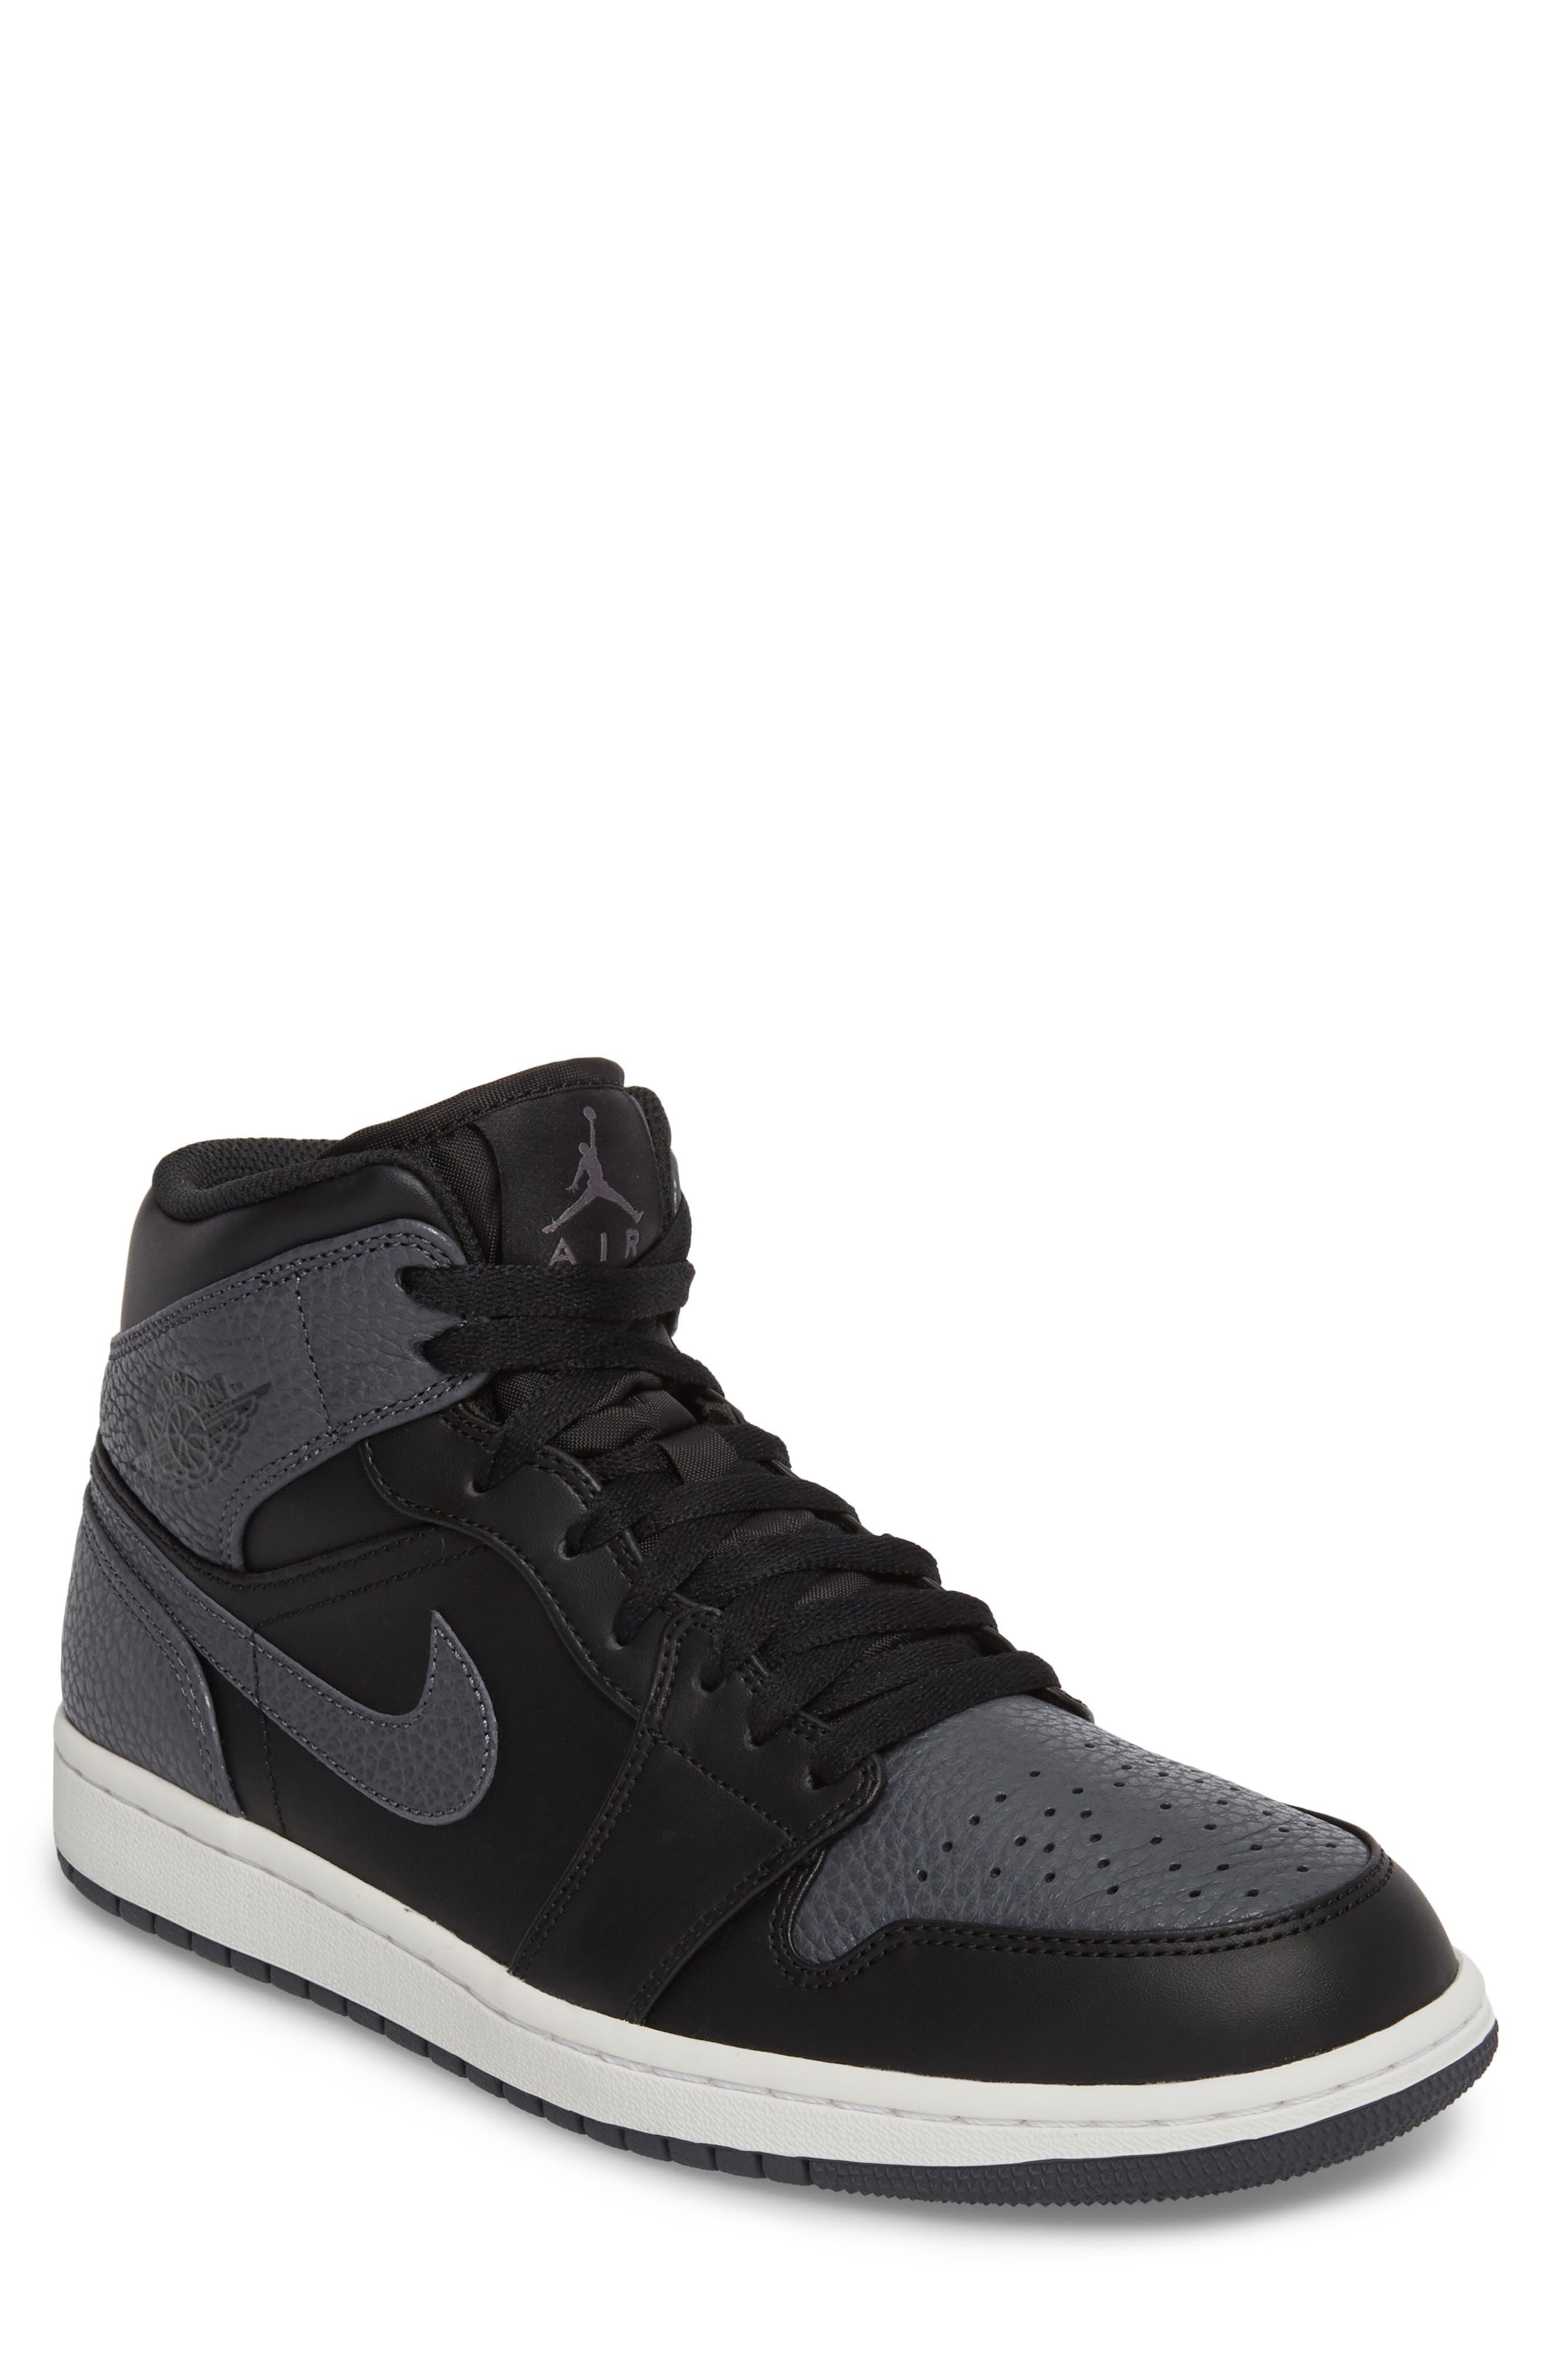 NIKE, 'Air Jordan 1 Mid' Sneaker, Main thumbnail 1, color, 001